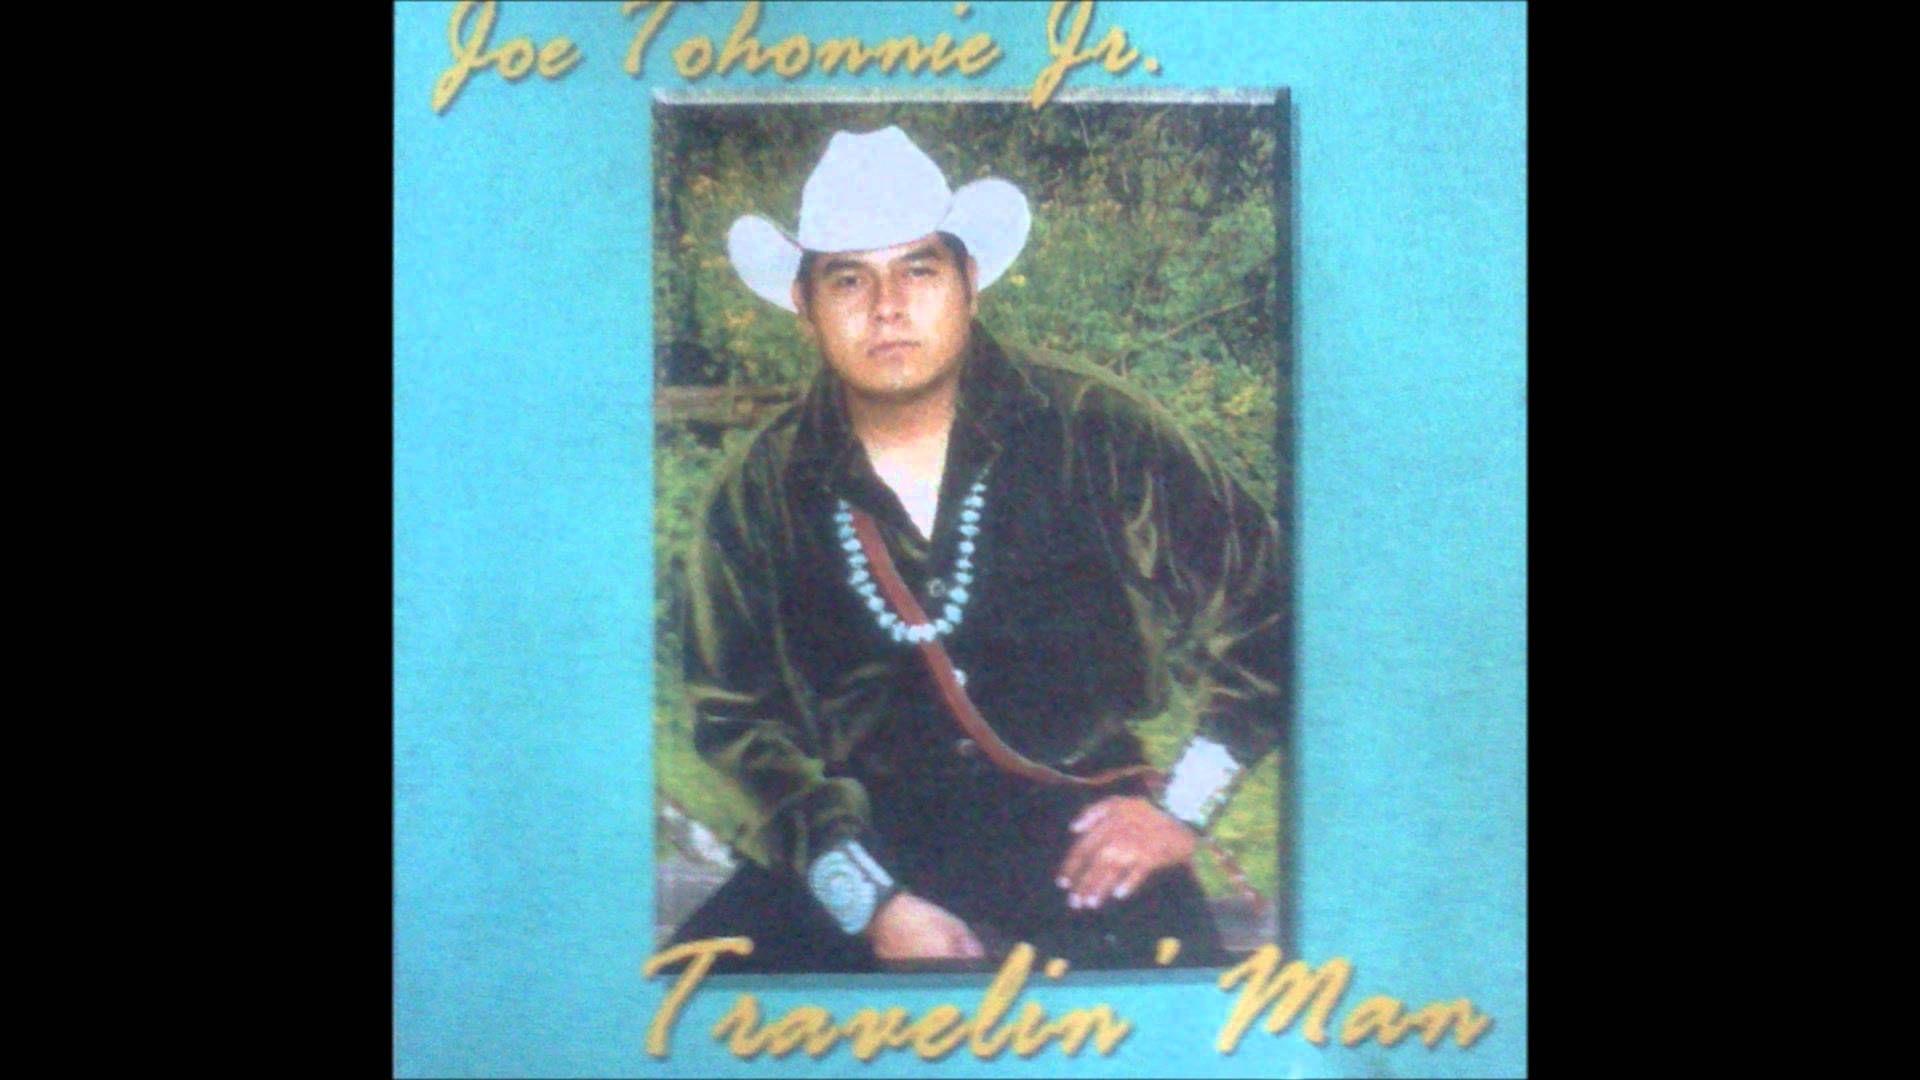 Mocassin Song: Joe Tohonnie Jr